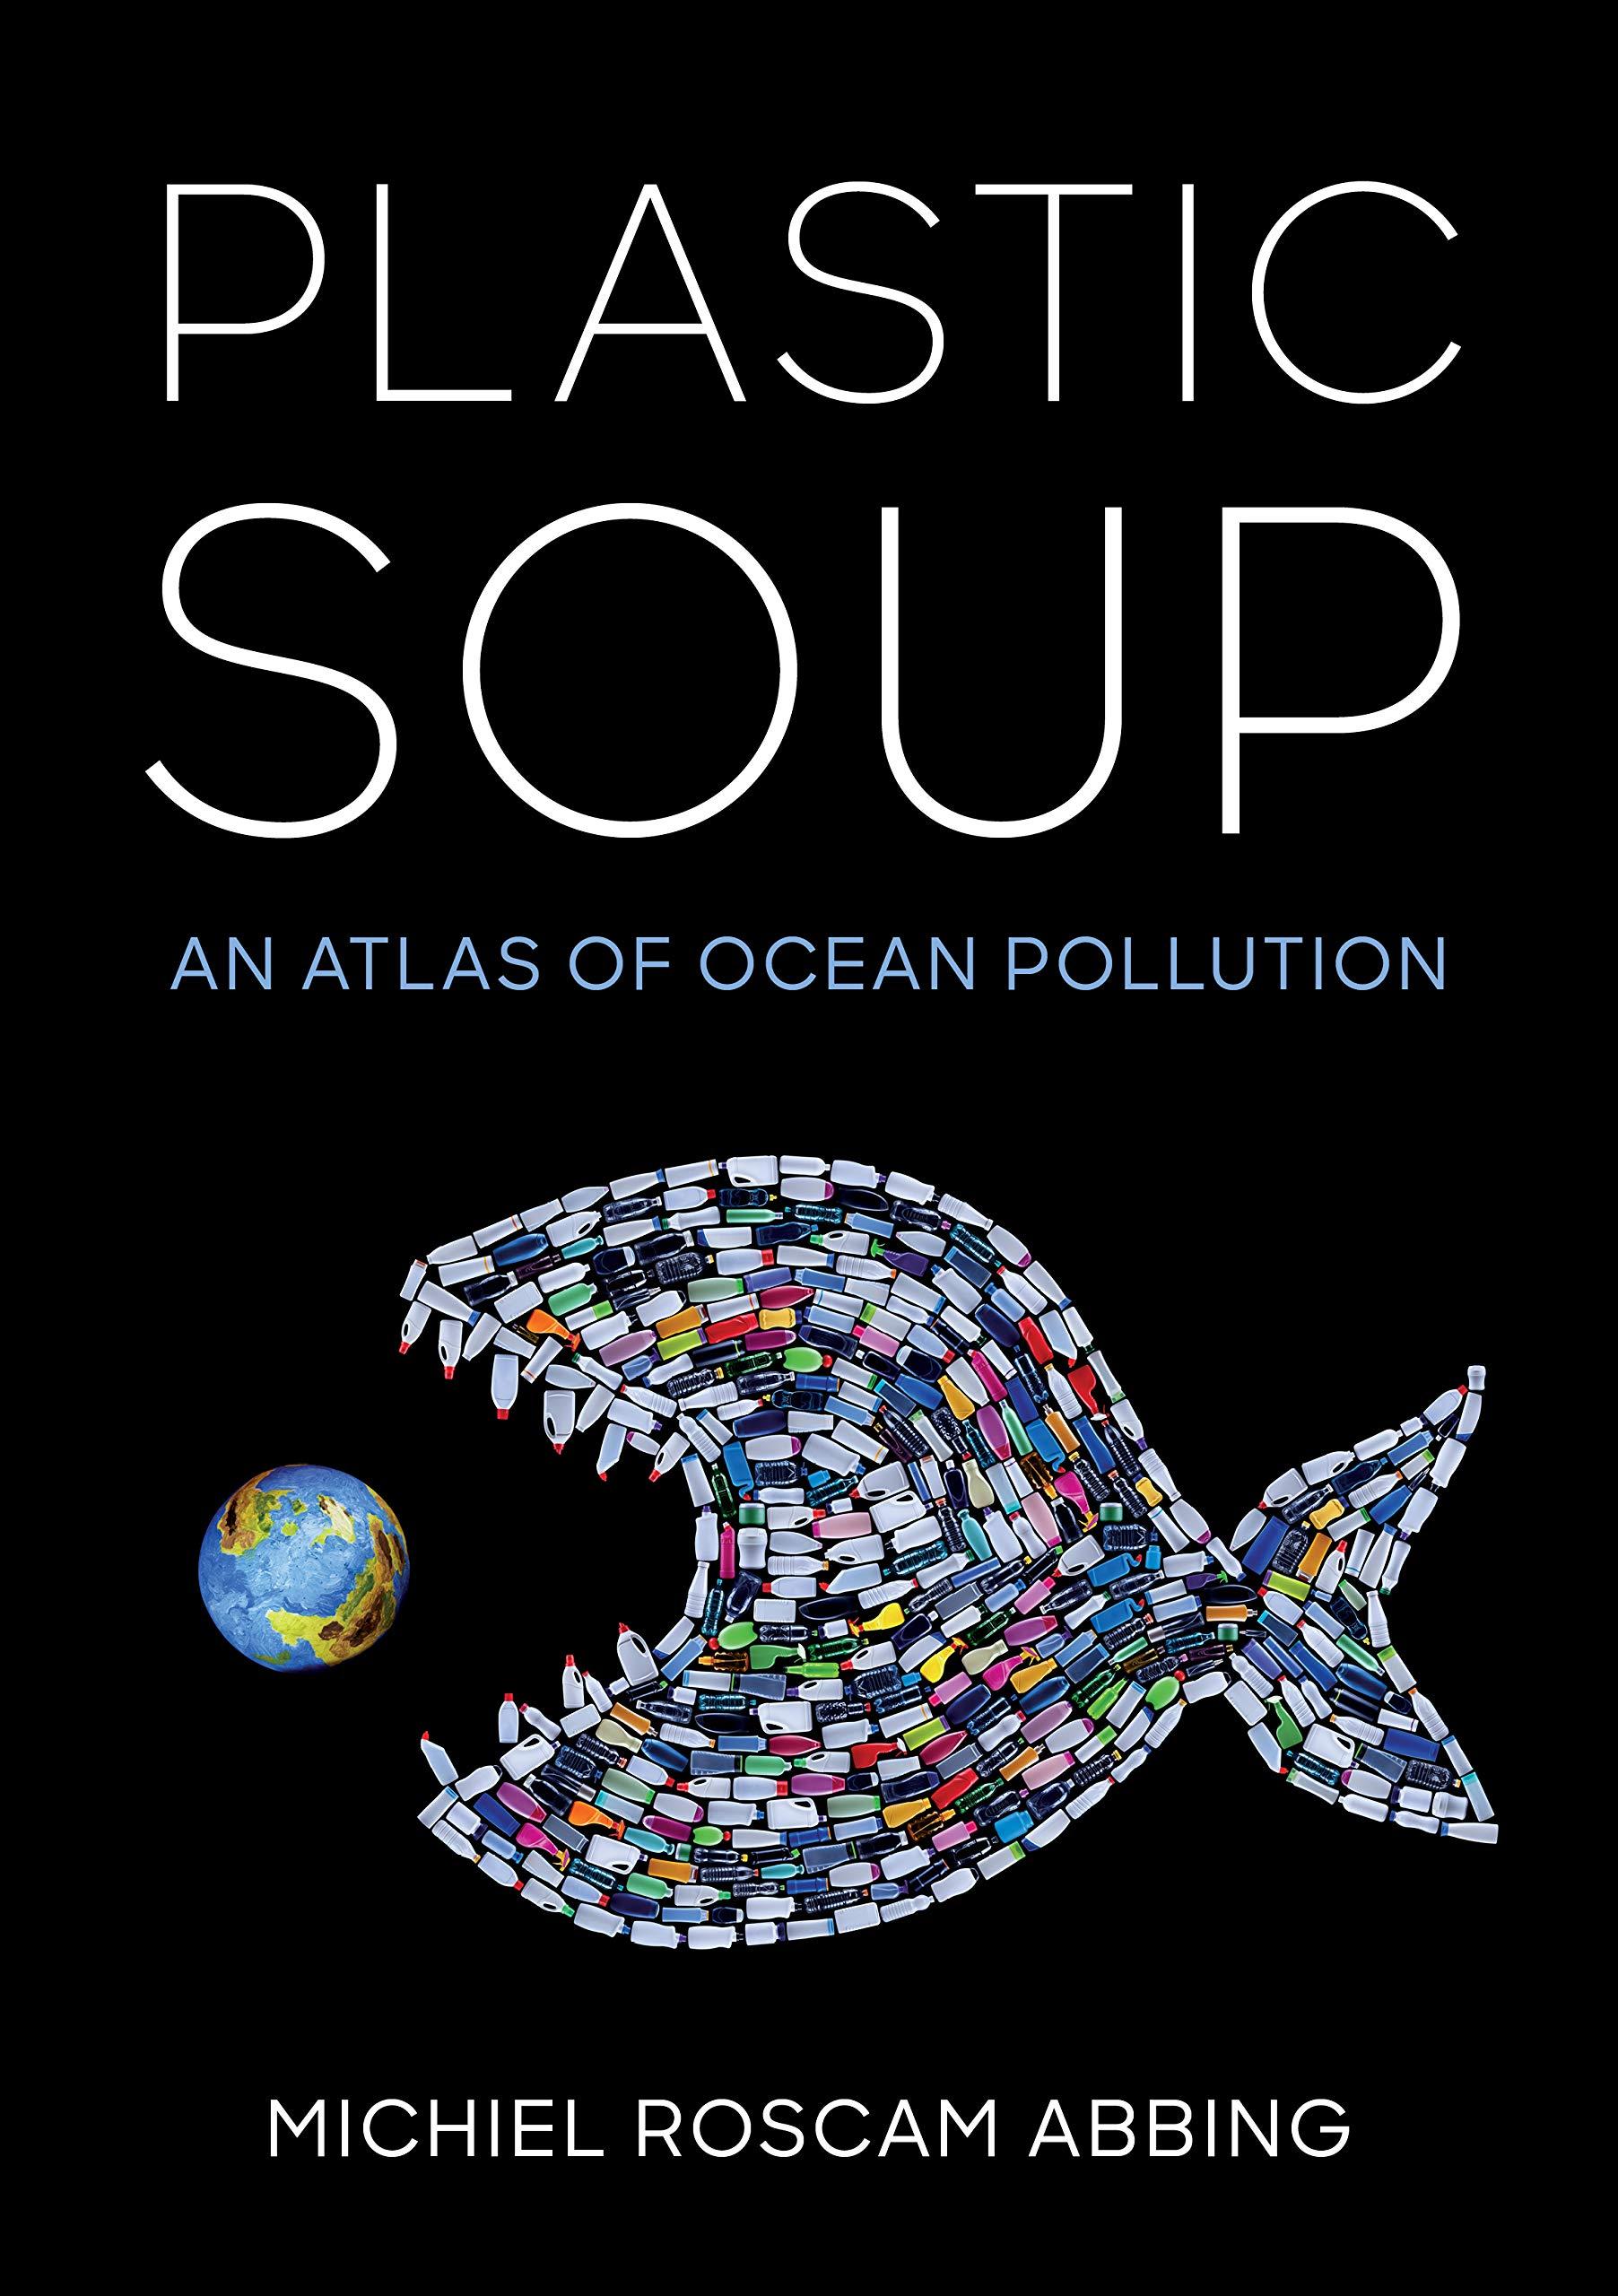 Plastic Soup: An Atlas of Ocean Pollution: Abbing, Michiel Roscam:  9781642830088: Amazon.com: Books